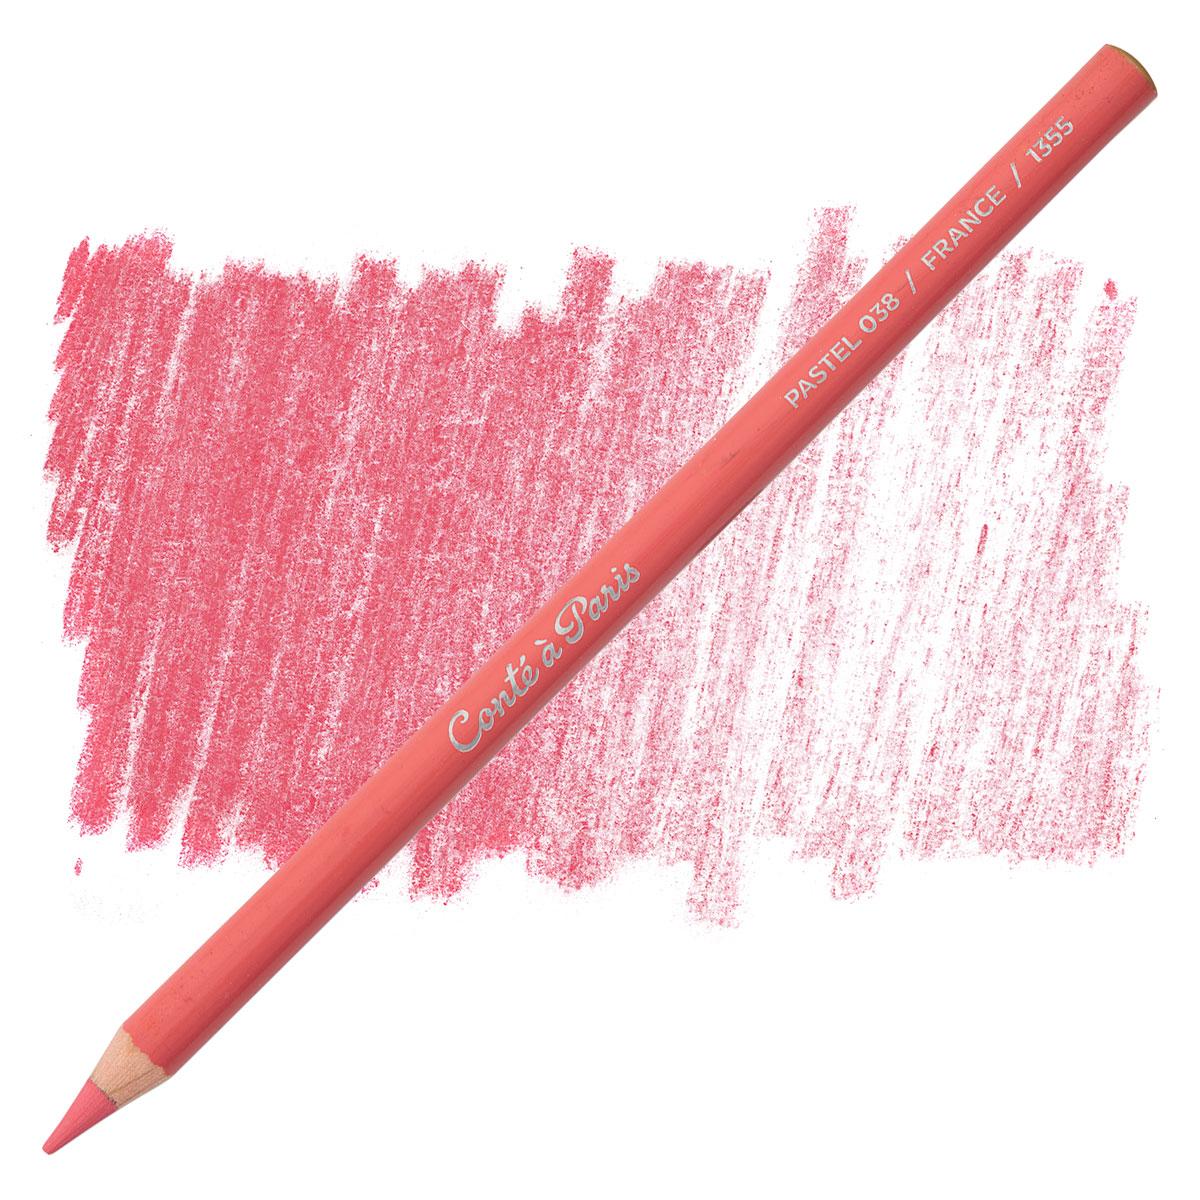 Conte a Paris Pastel Pencil Madder